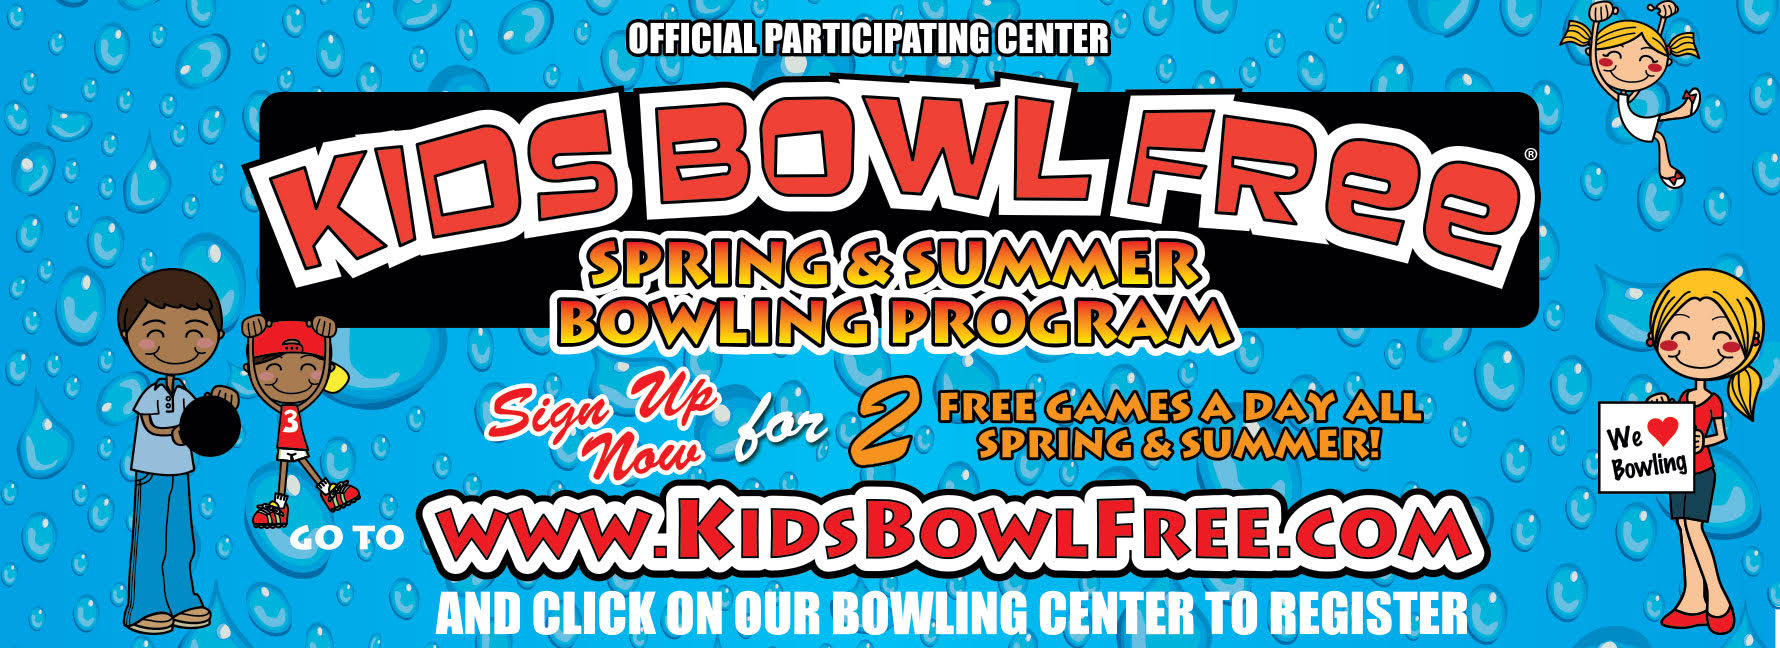 Kids Bowl Free Colony Park Lanes